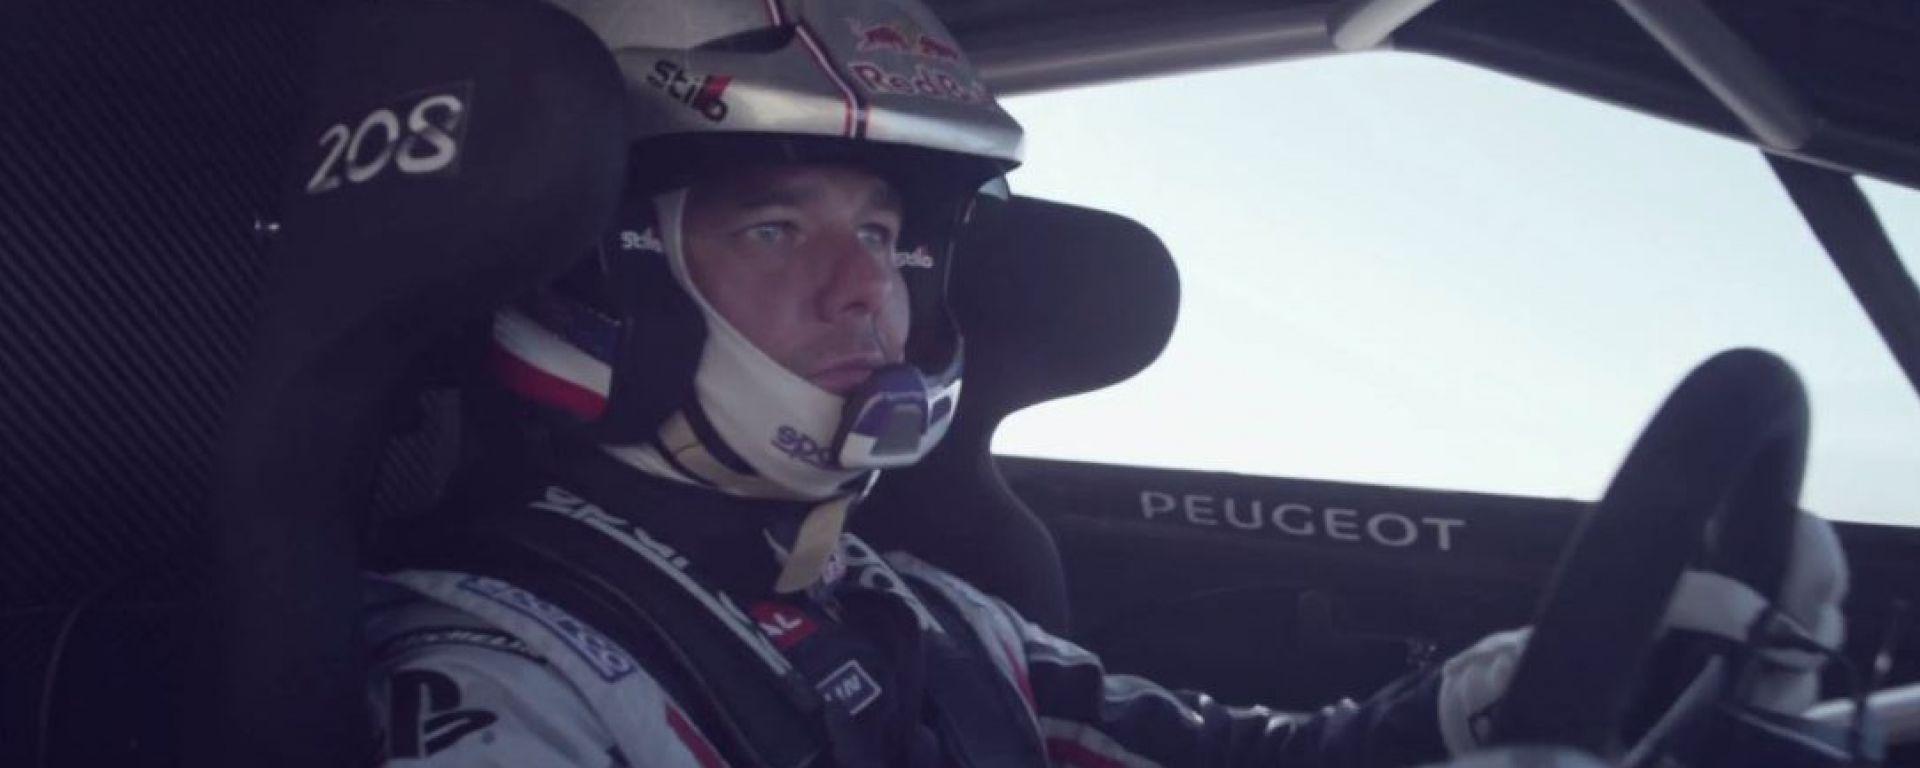 Peugeot 208 T16 Pikes Peak, gli ultimi collaudi